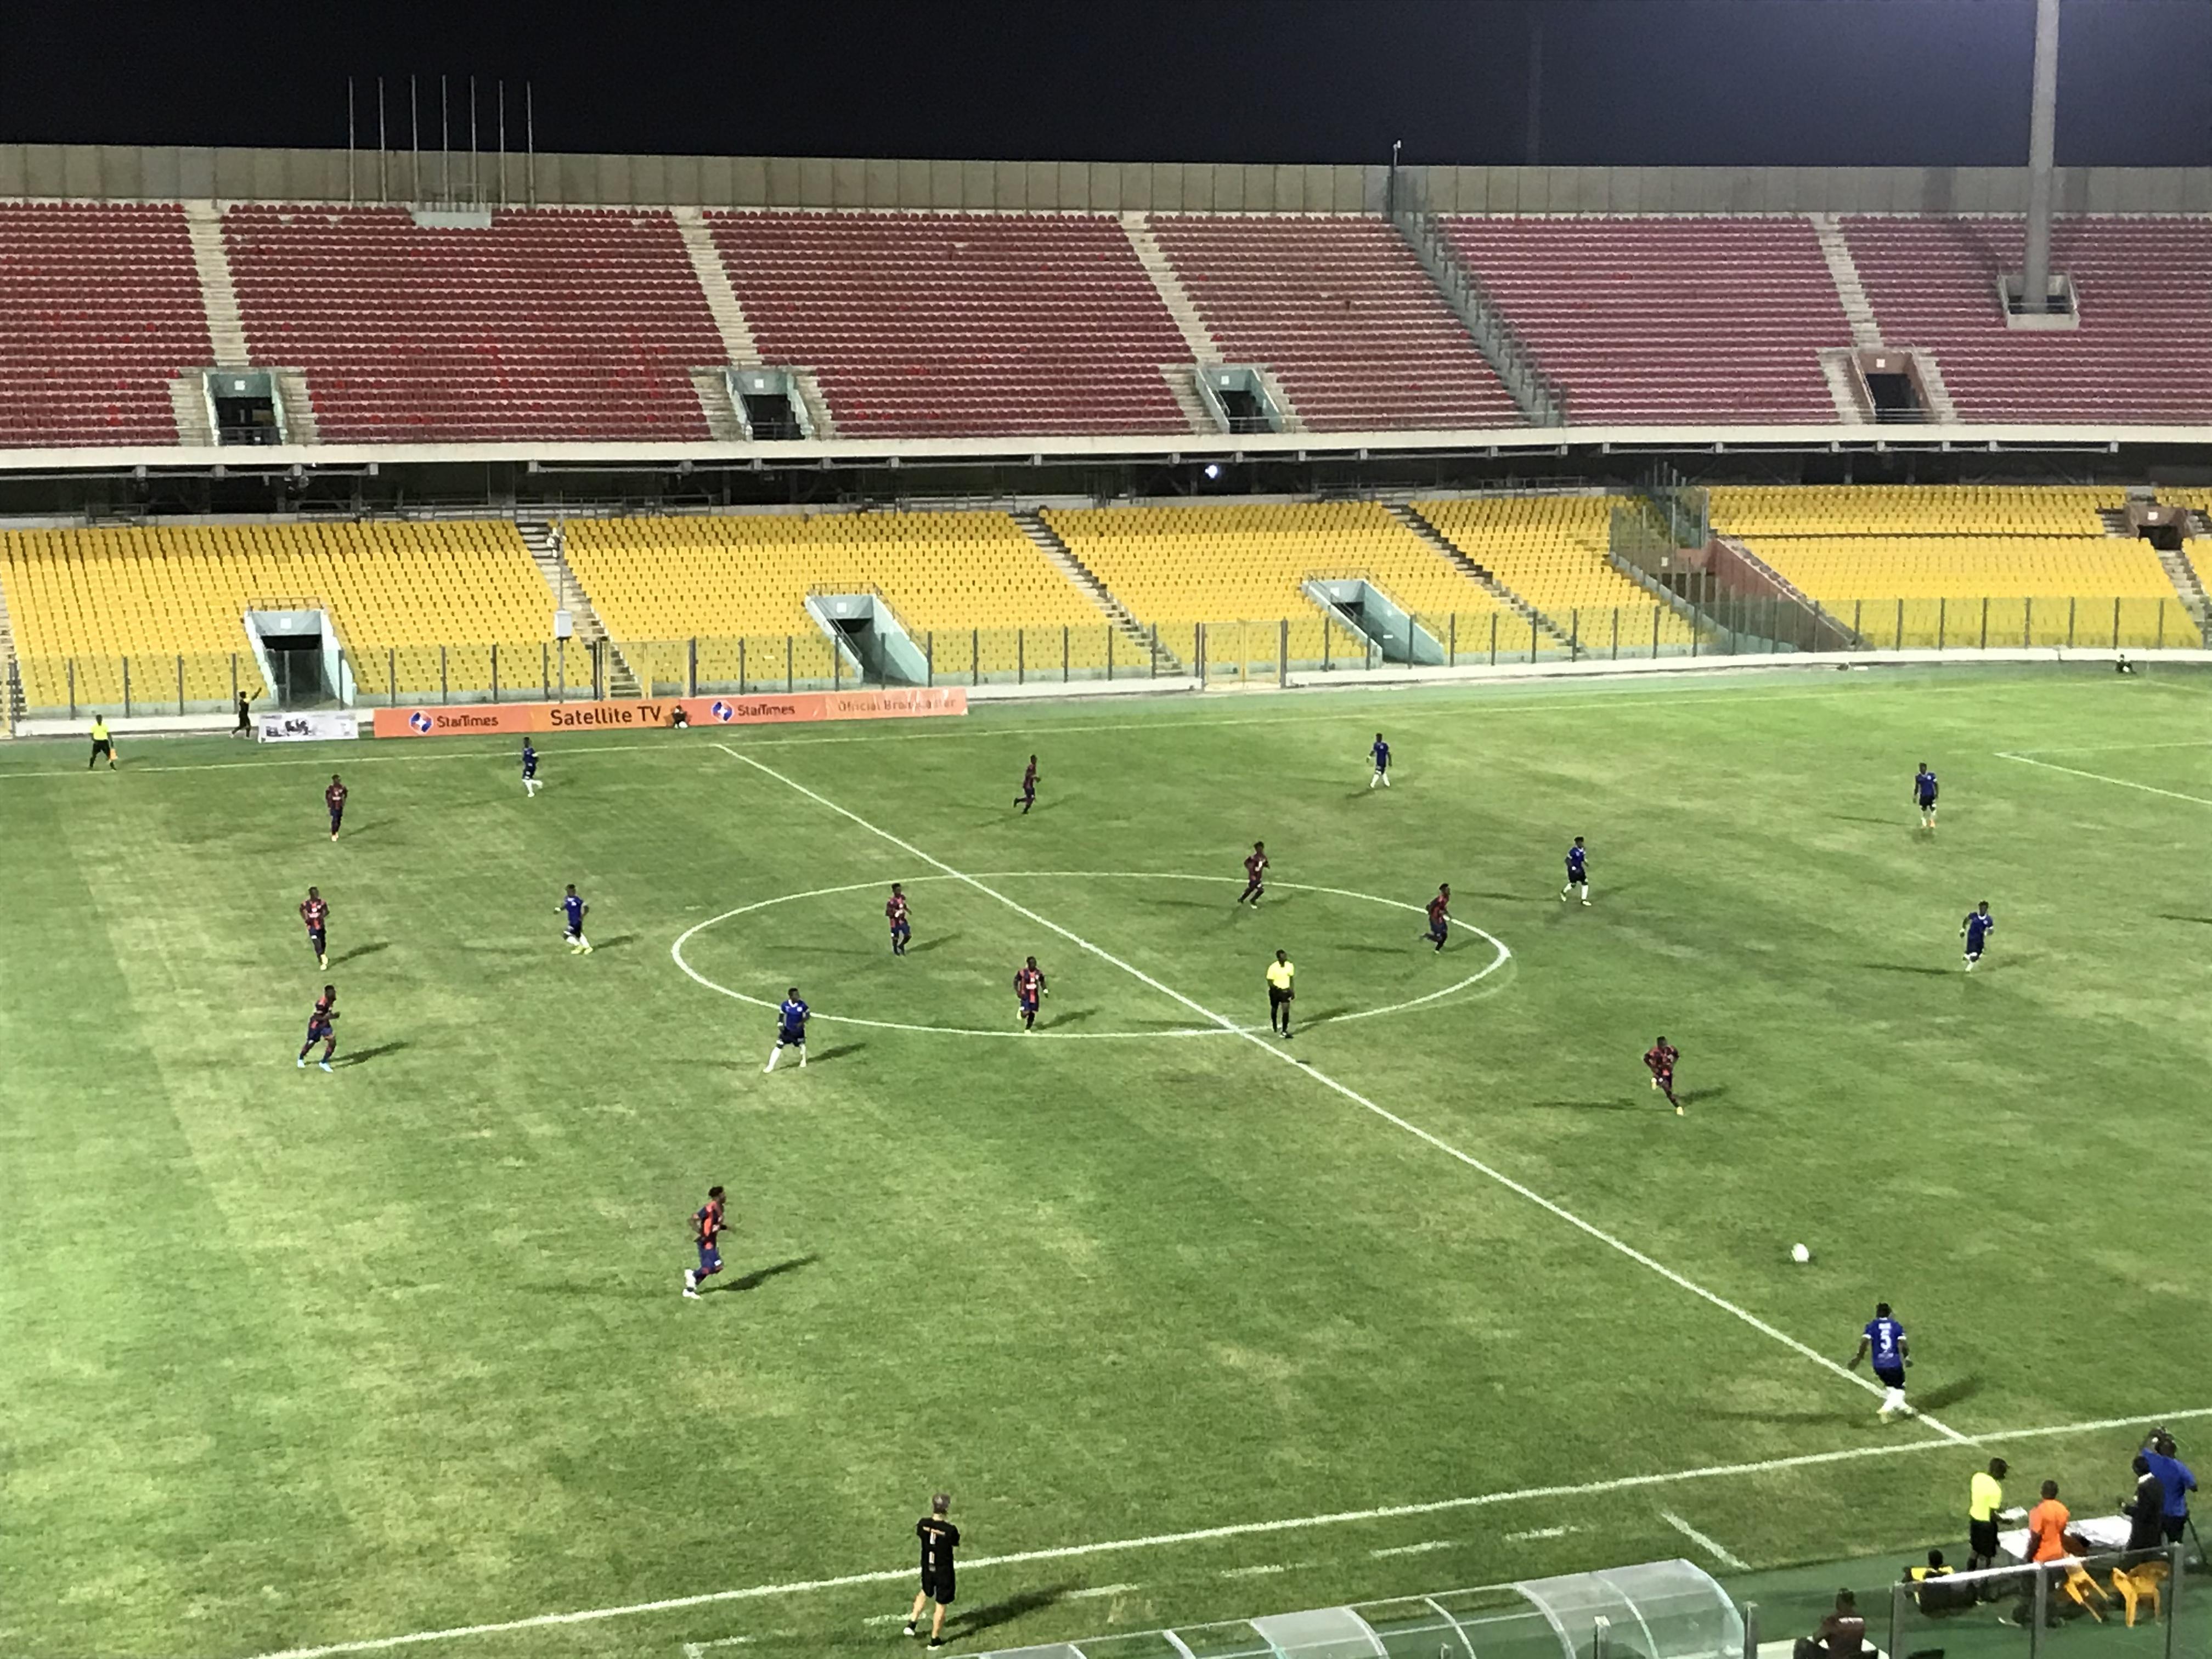 LIVE UPDATES: Legon Cities FC 1-1 Berekum Chelsea – Ghana Premier League Matchday 1